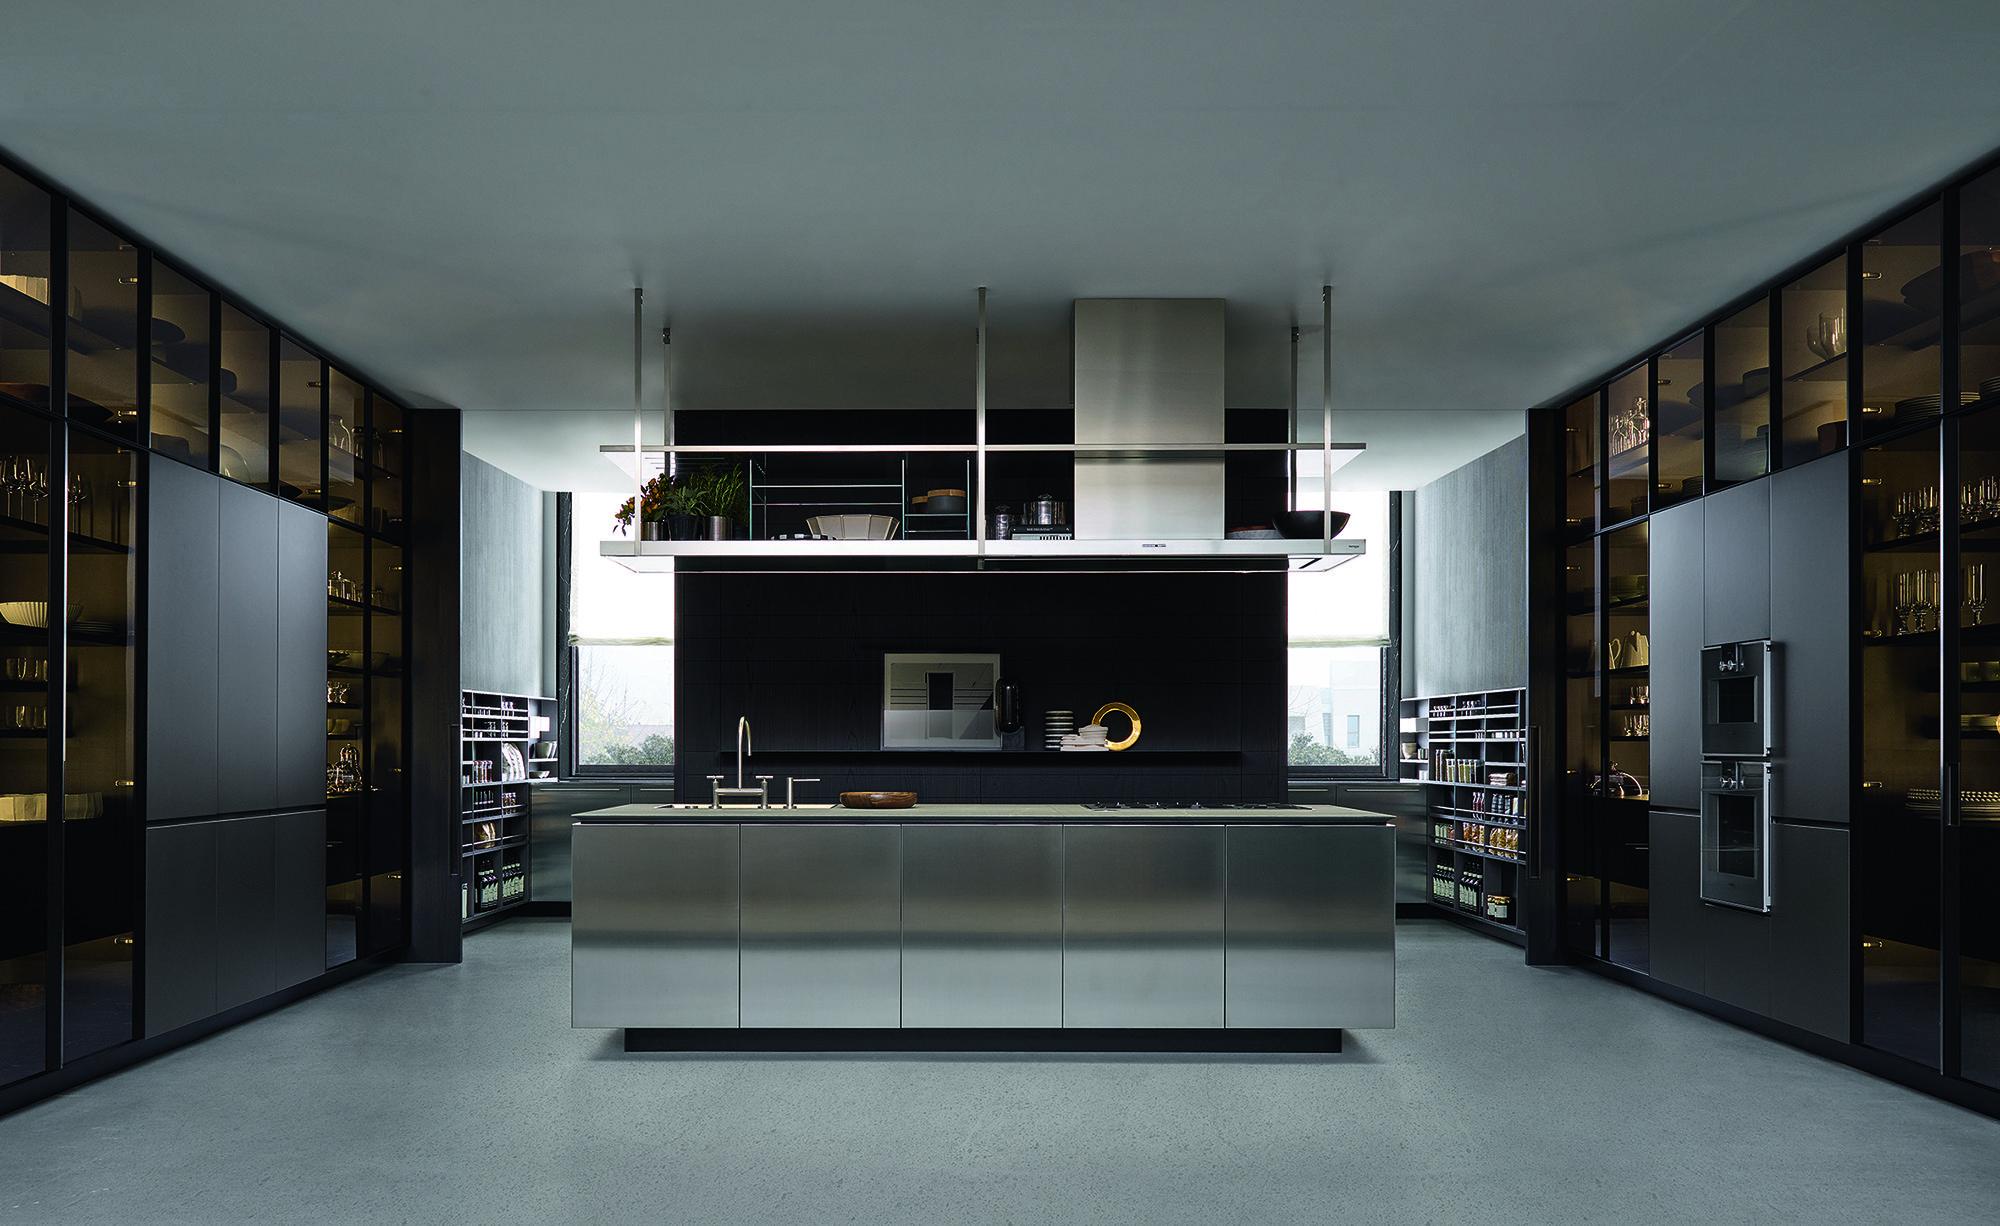 Cucina Varenna | Cucine Varenna Prezzi Top Cucina Leroy Merlin Top ...